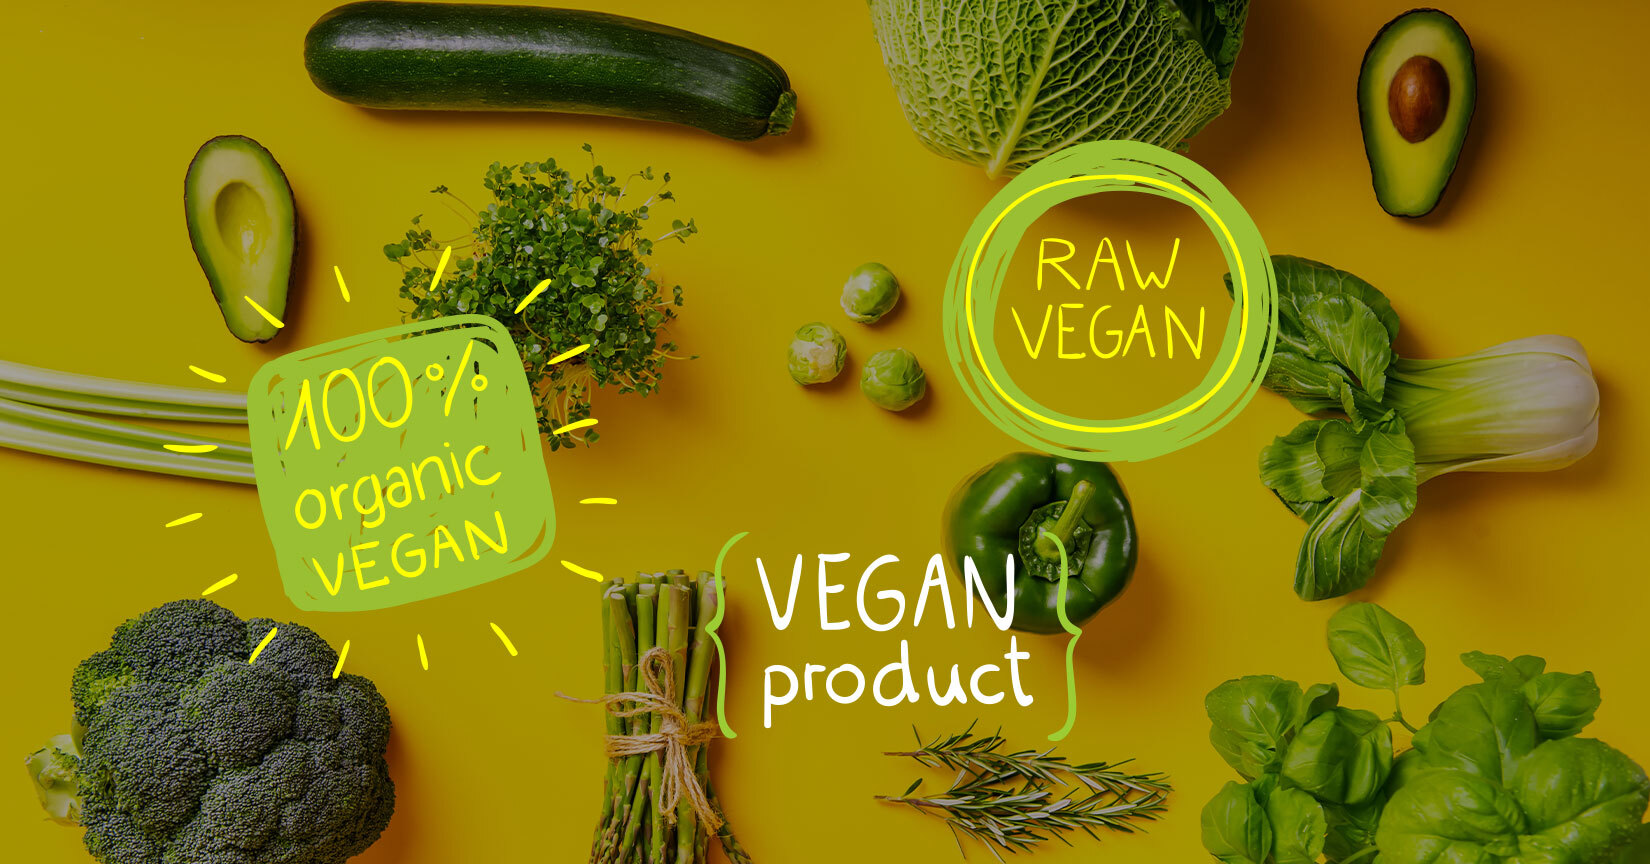 raw vegans image cover blog post